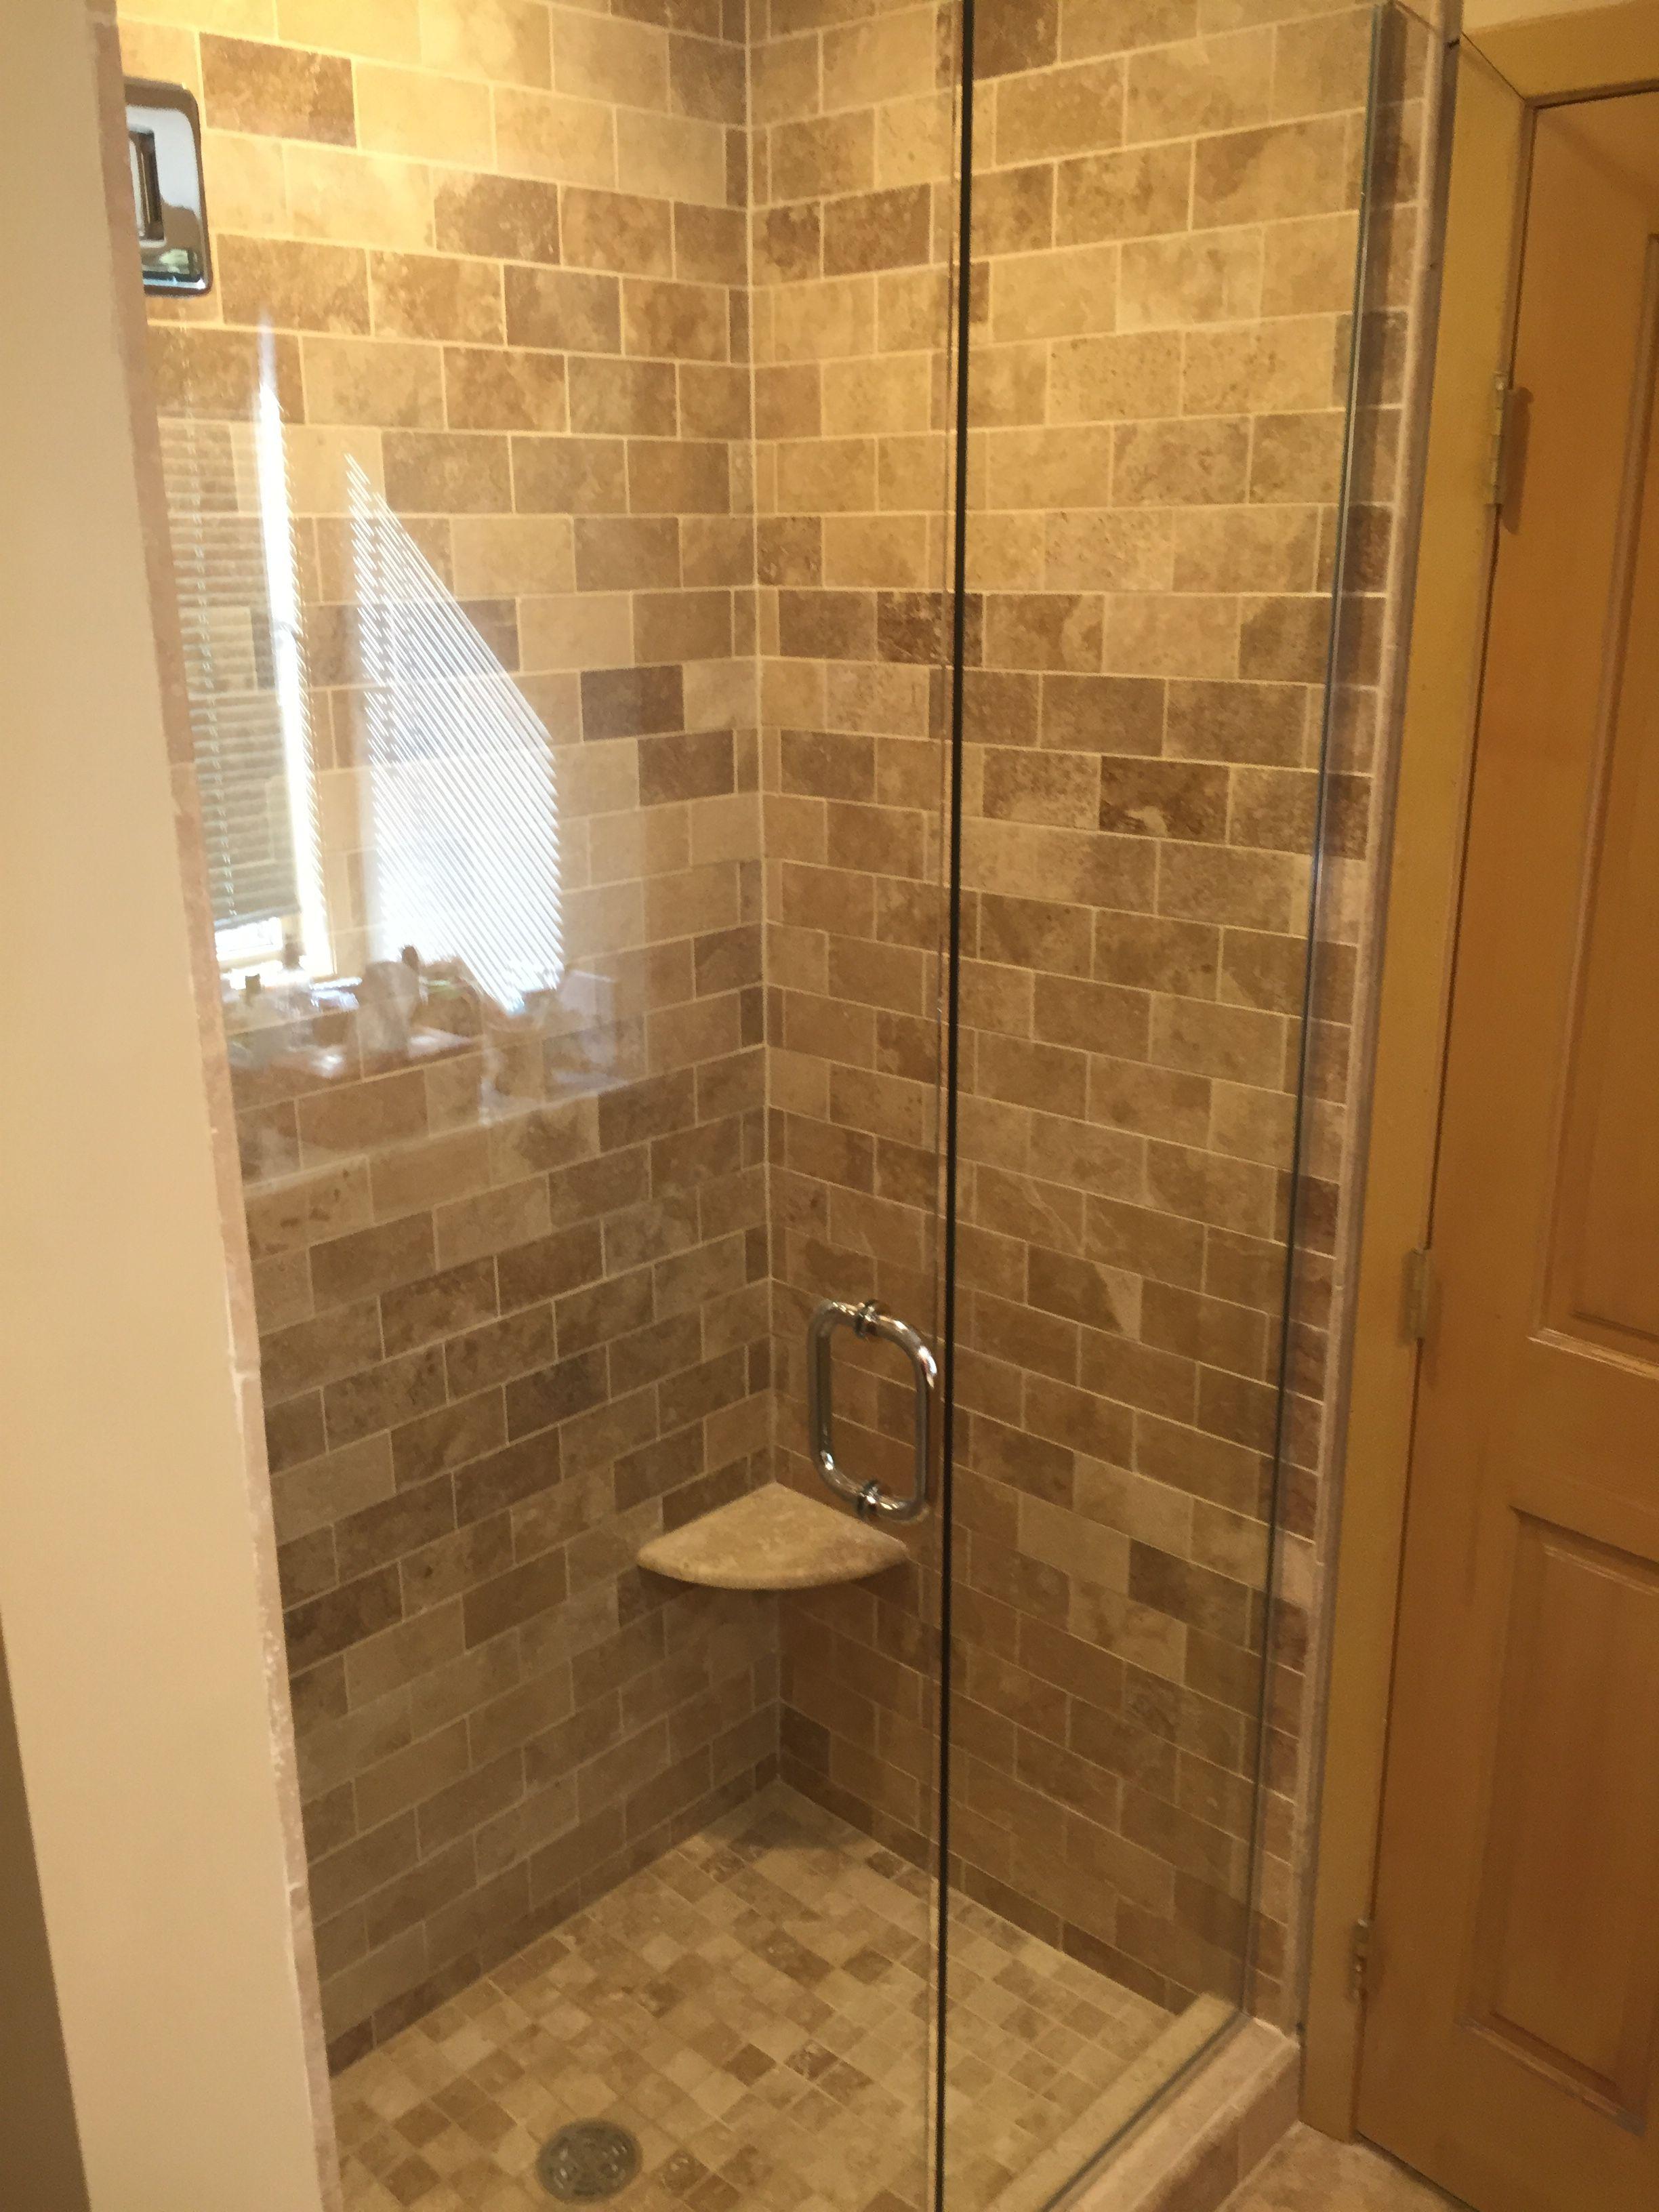 Minneapolis / St. Paul, MN Bathroom Remodel